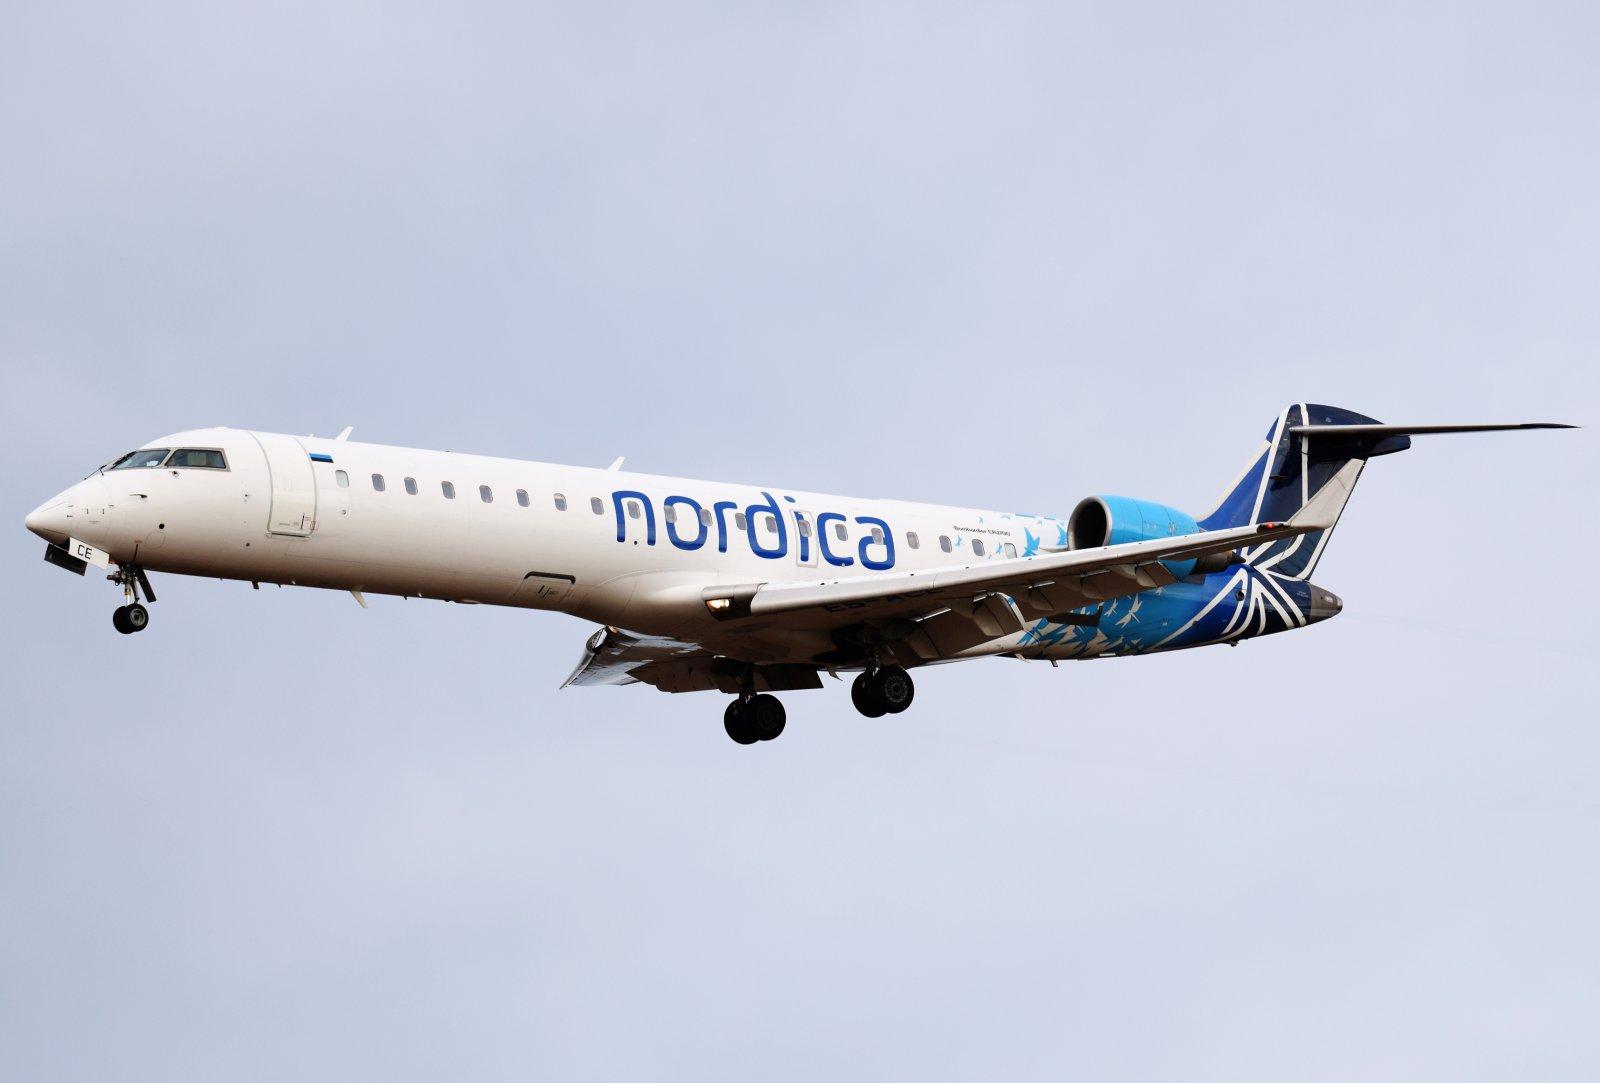 ES-ACE - Bombardier CRJ-701ER - Nordica - 7.5.2019